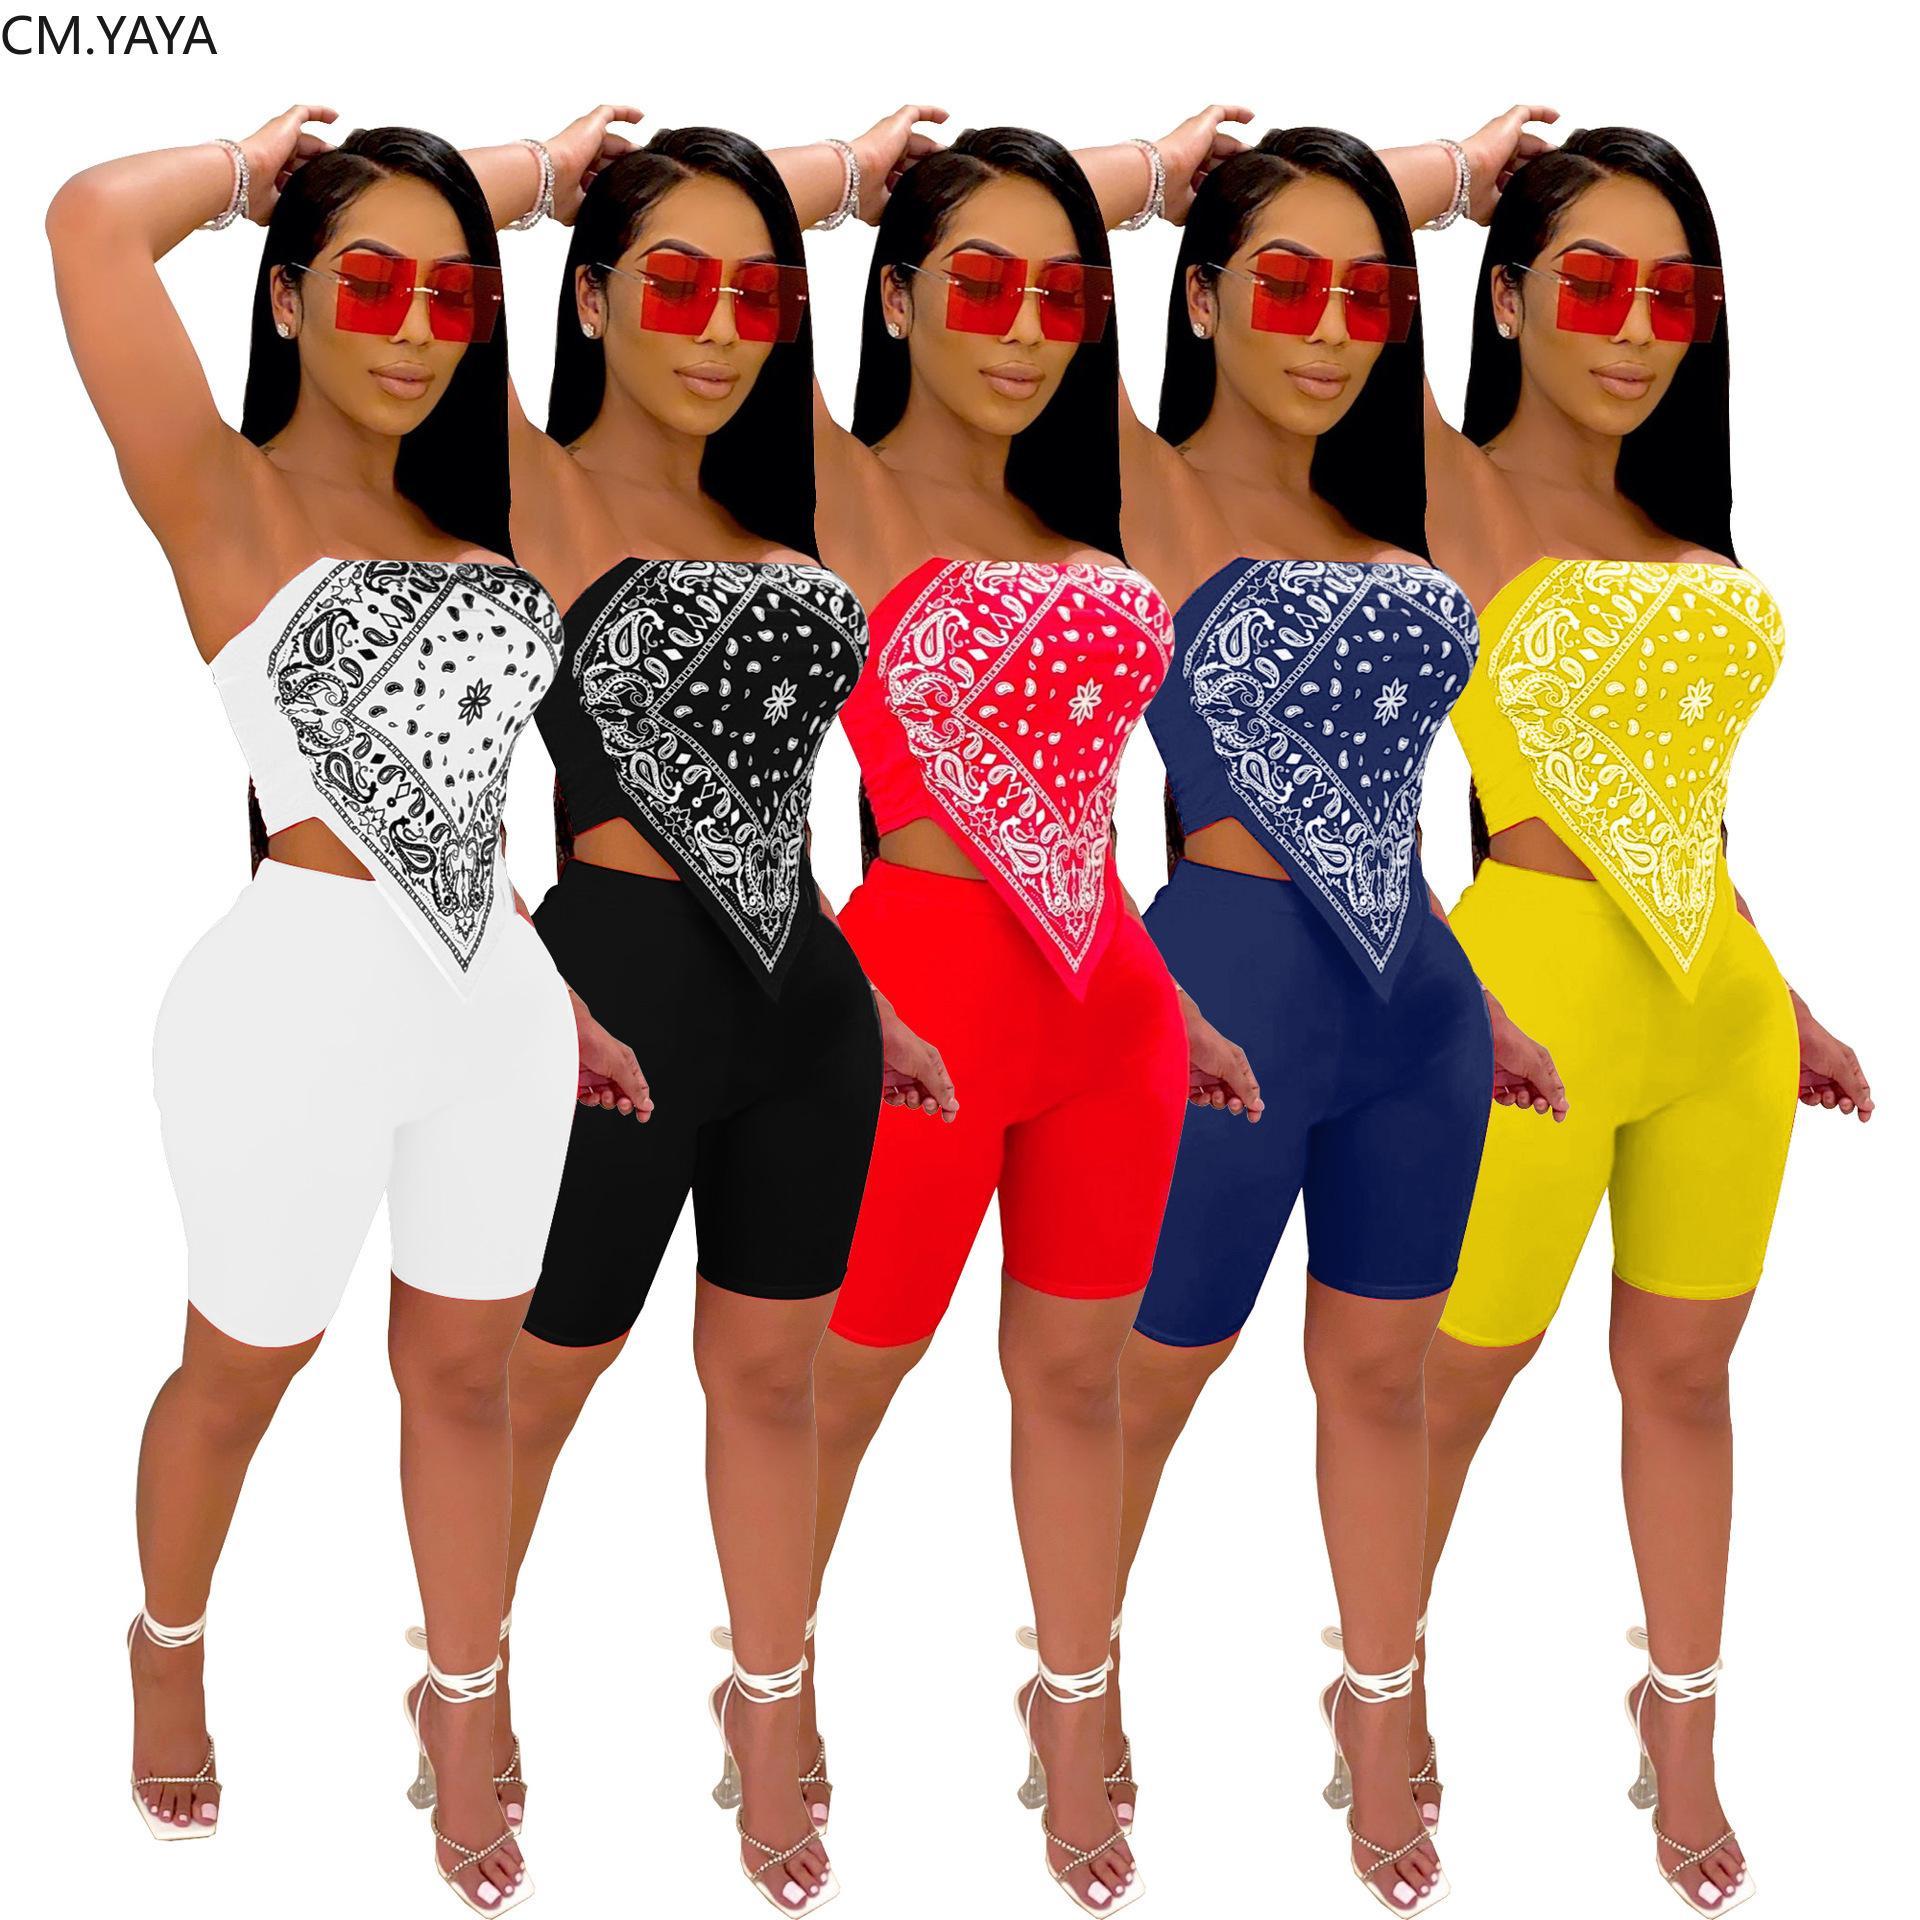 CM.YAYA Frauen Bandana Drucken Bauchband Mini Crop Tops knielangen Shorts Jogger Hosenanzug Zweiteiler Sport Anzug Outfits